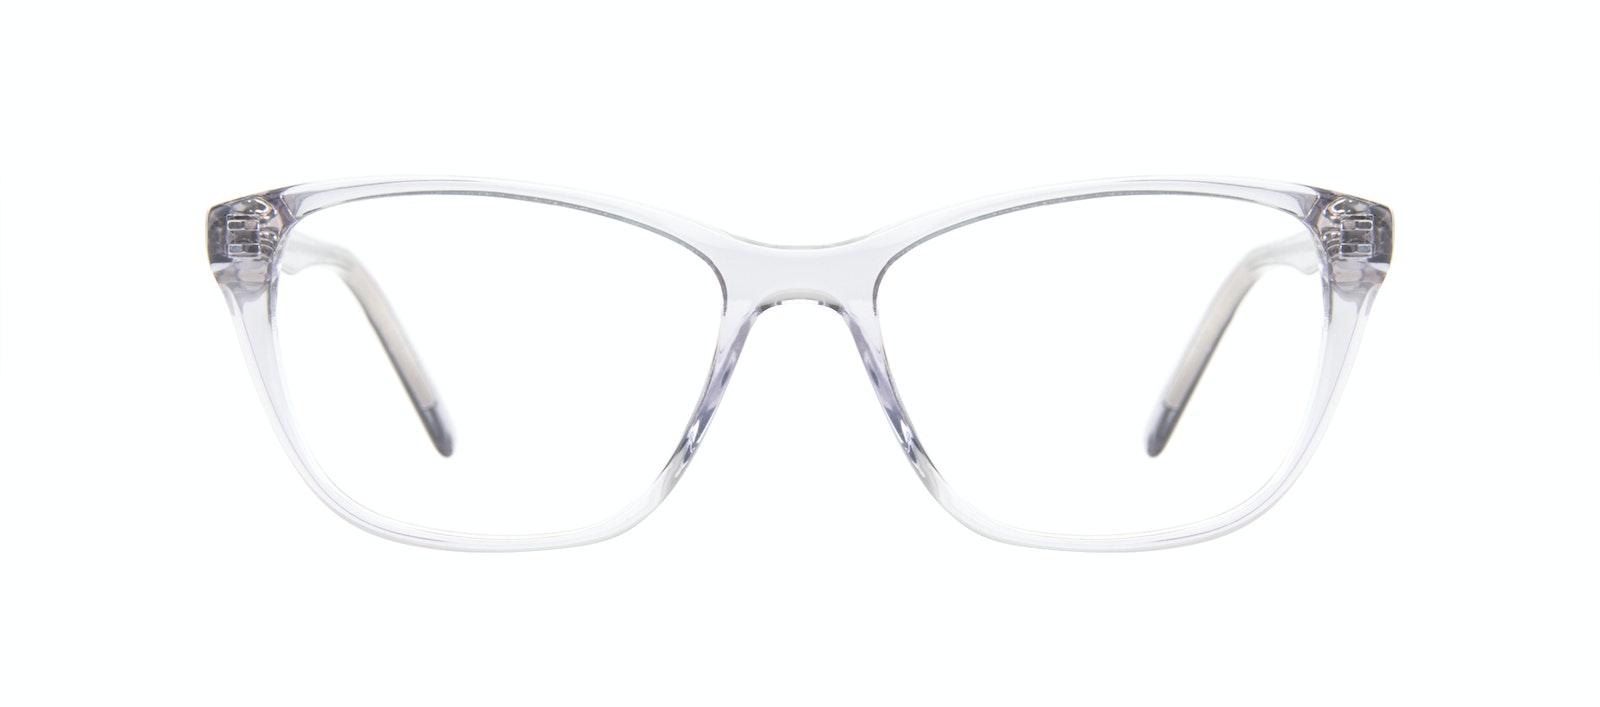 Affordable Fashion Glasses Cat Eye Eyeglasses Women Myrtle Petite Cloud Front